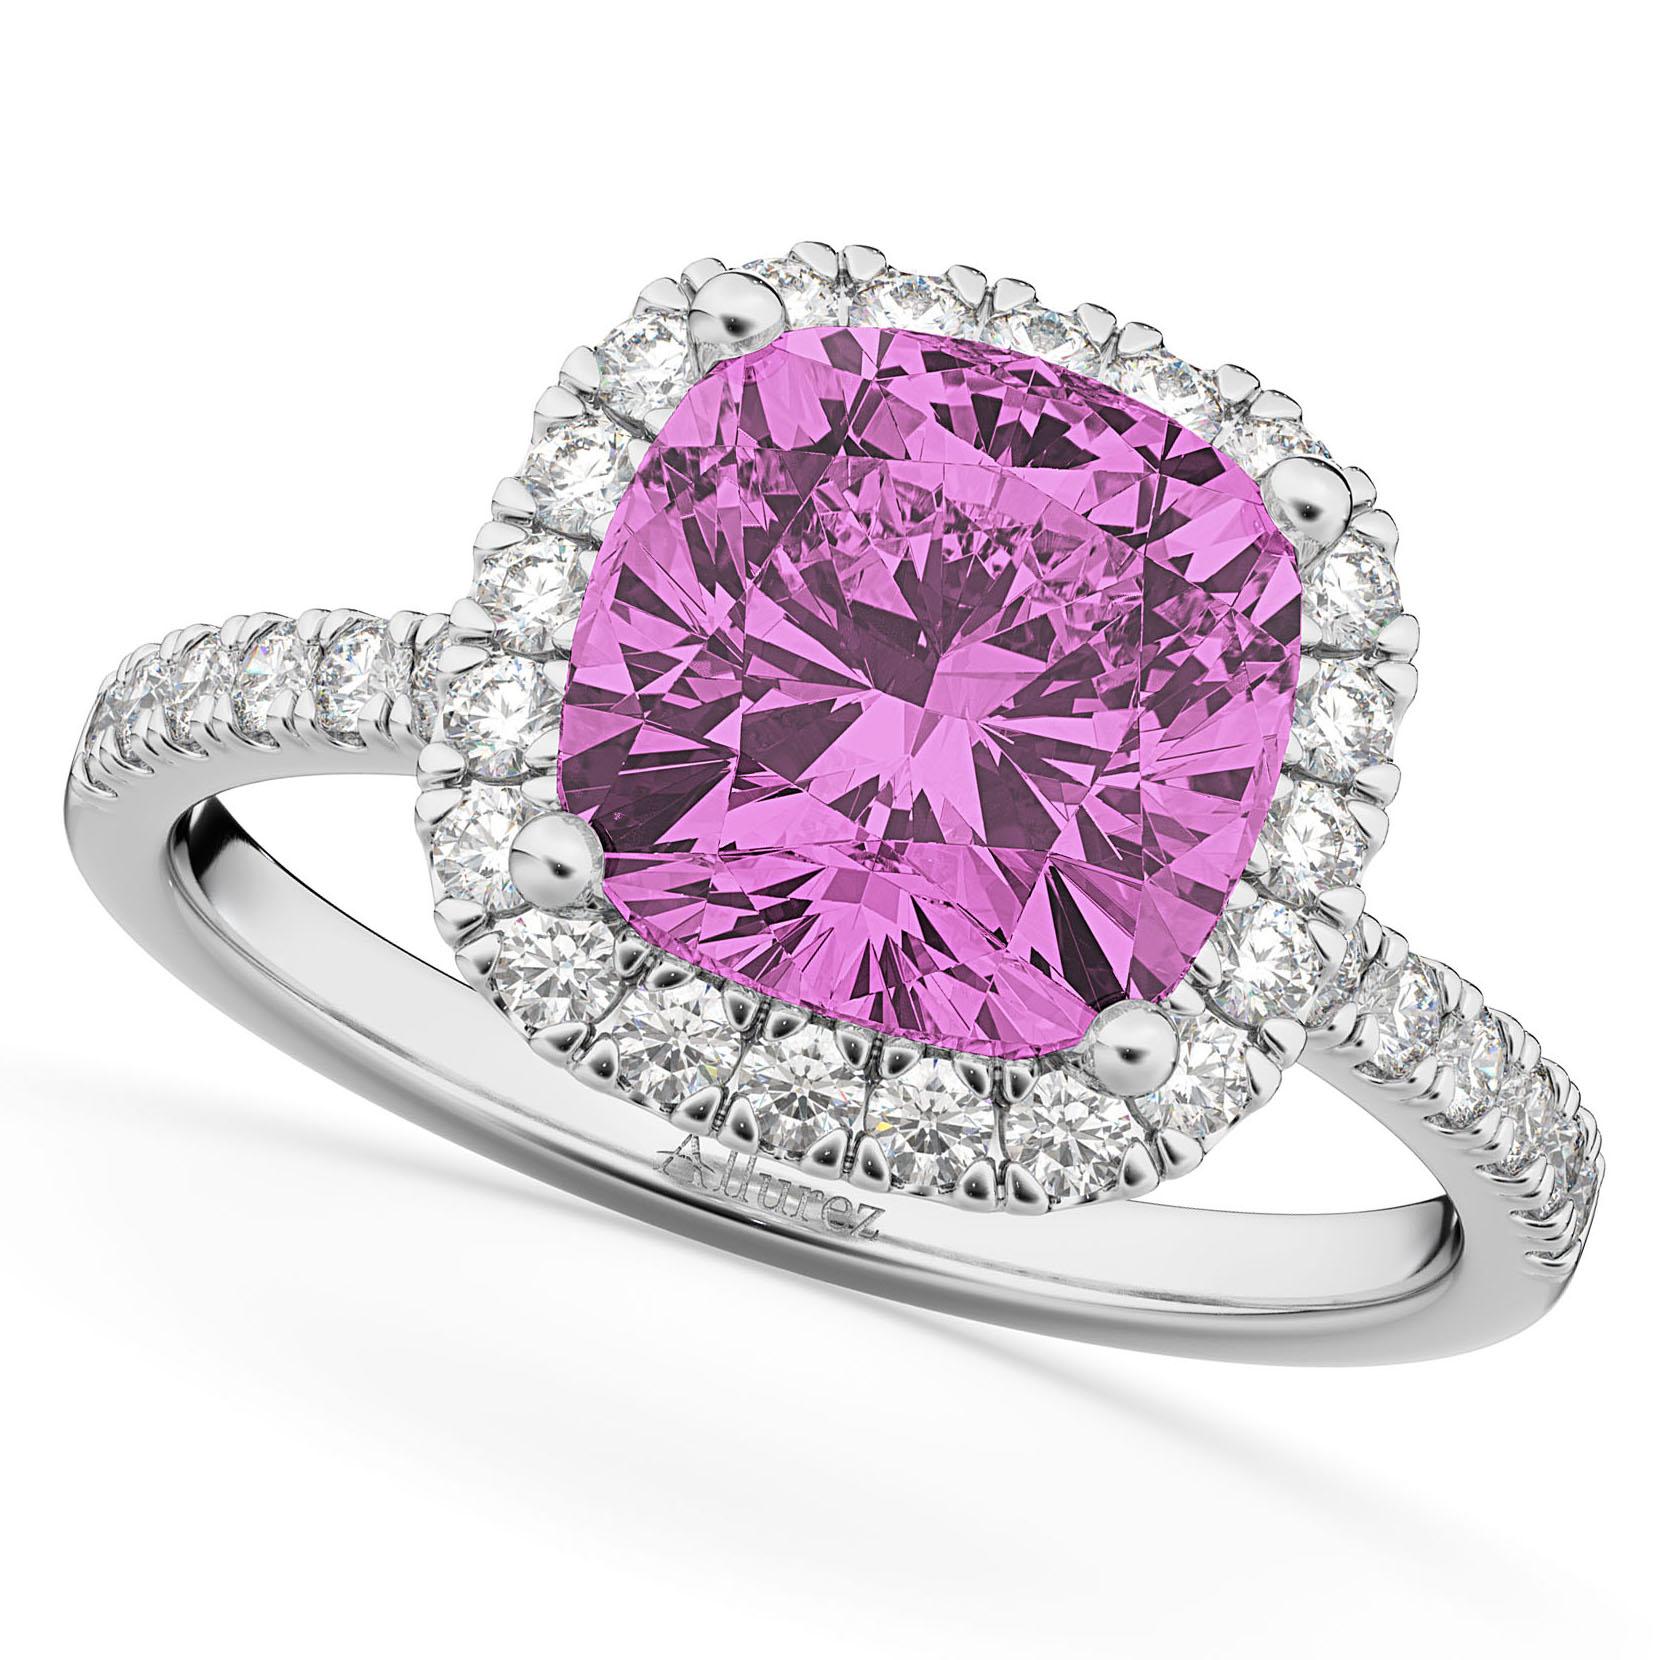 Cushion Cut Halo Pink Sapphire & Diamond Engagement Ring 14k White Gold (3.11ct)